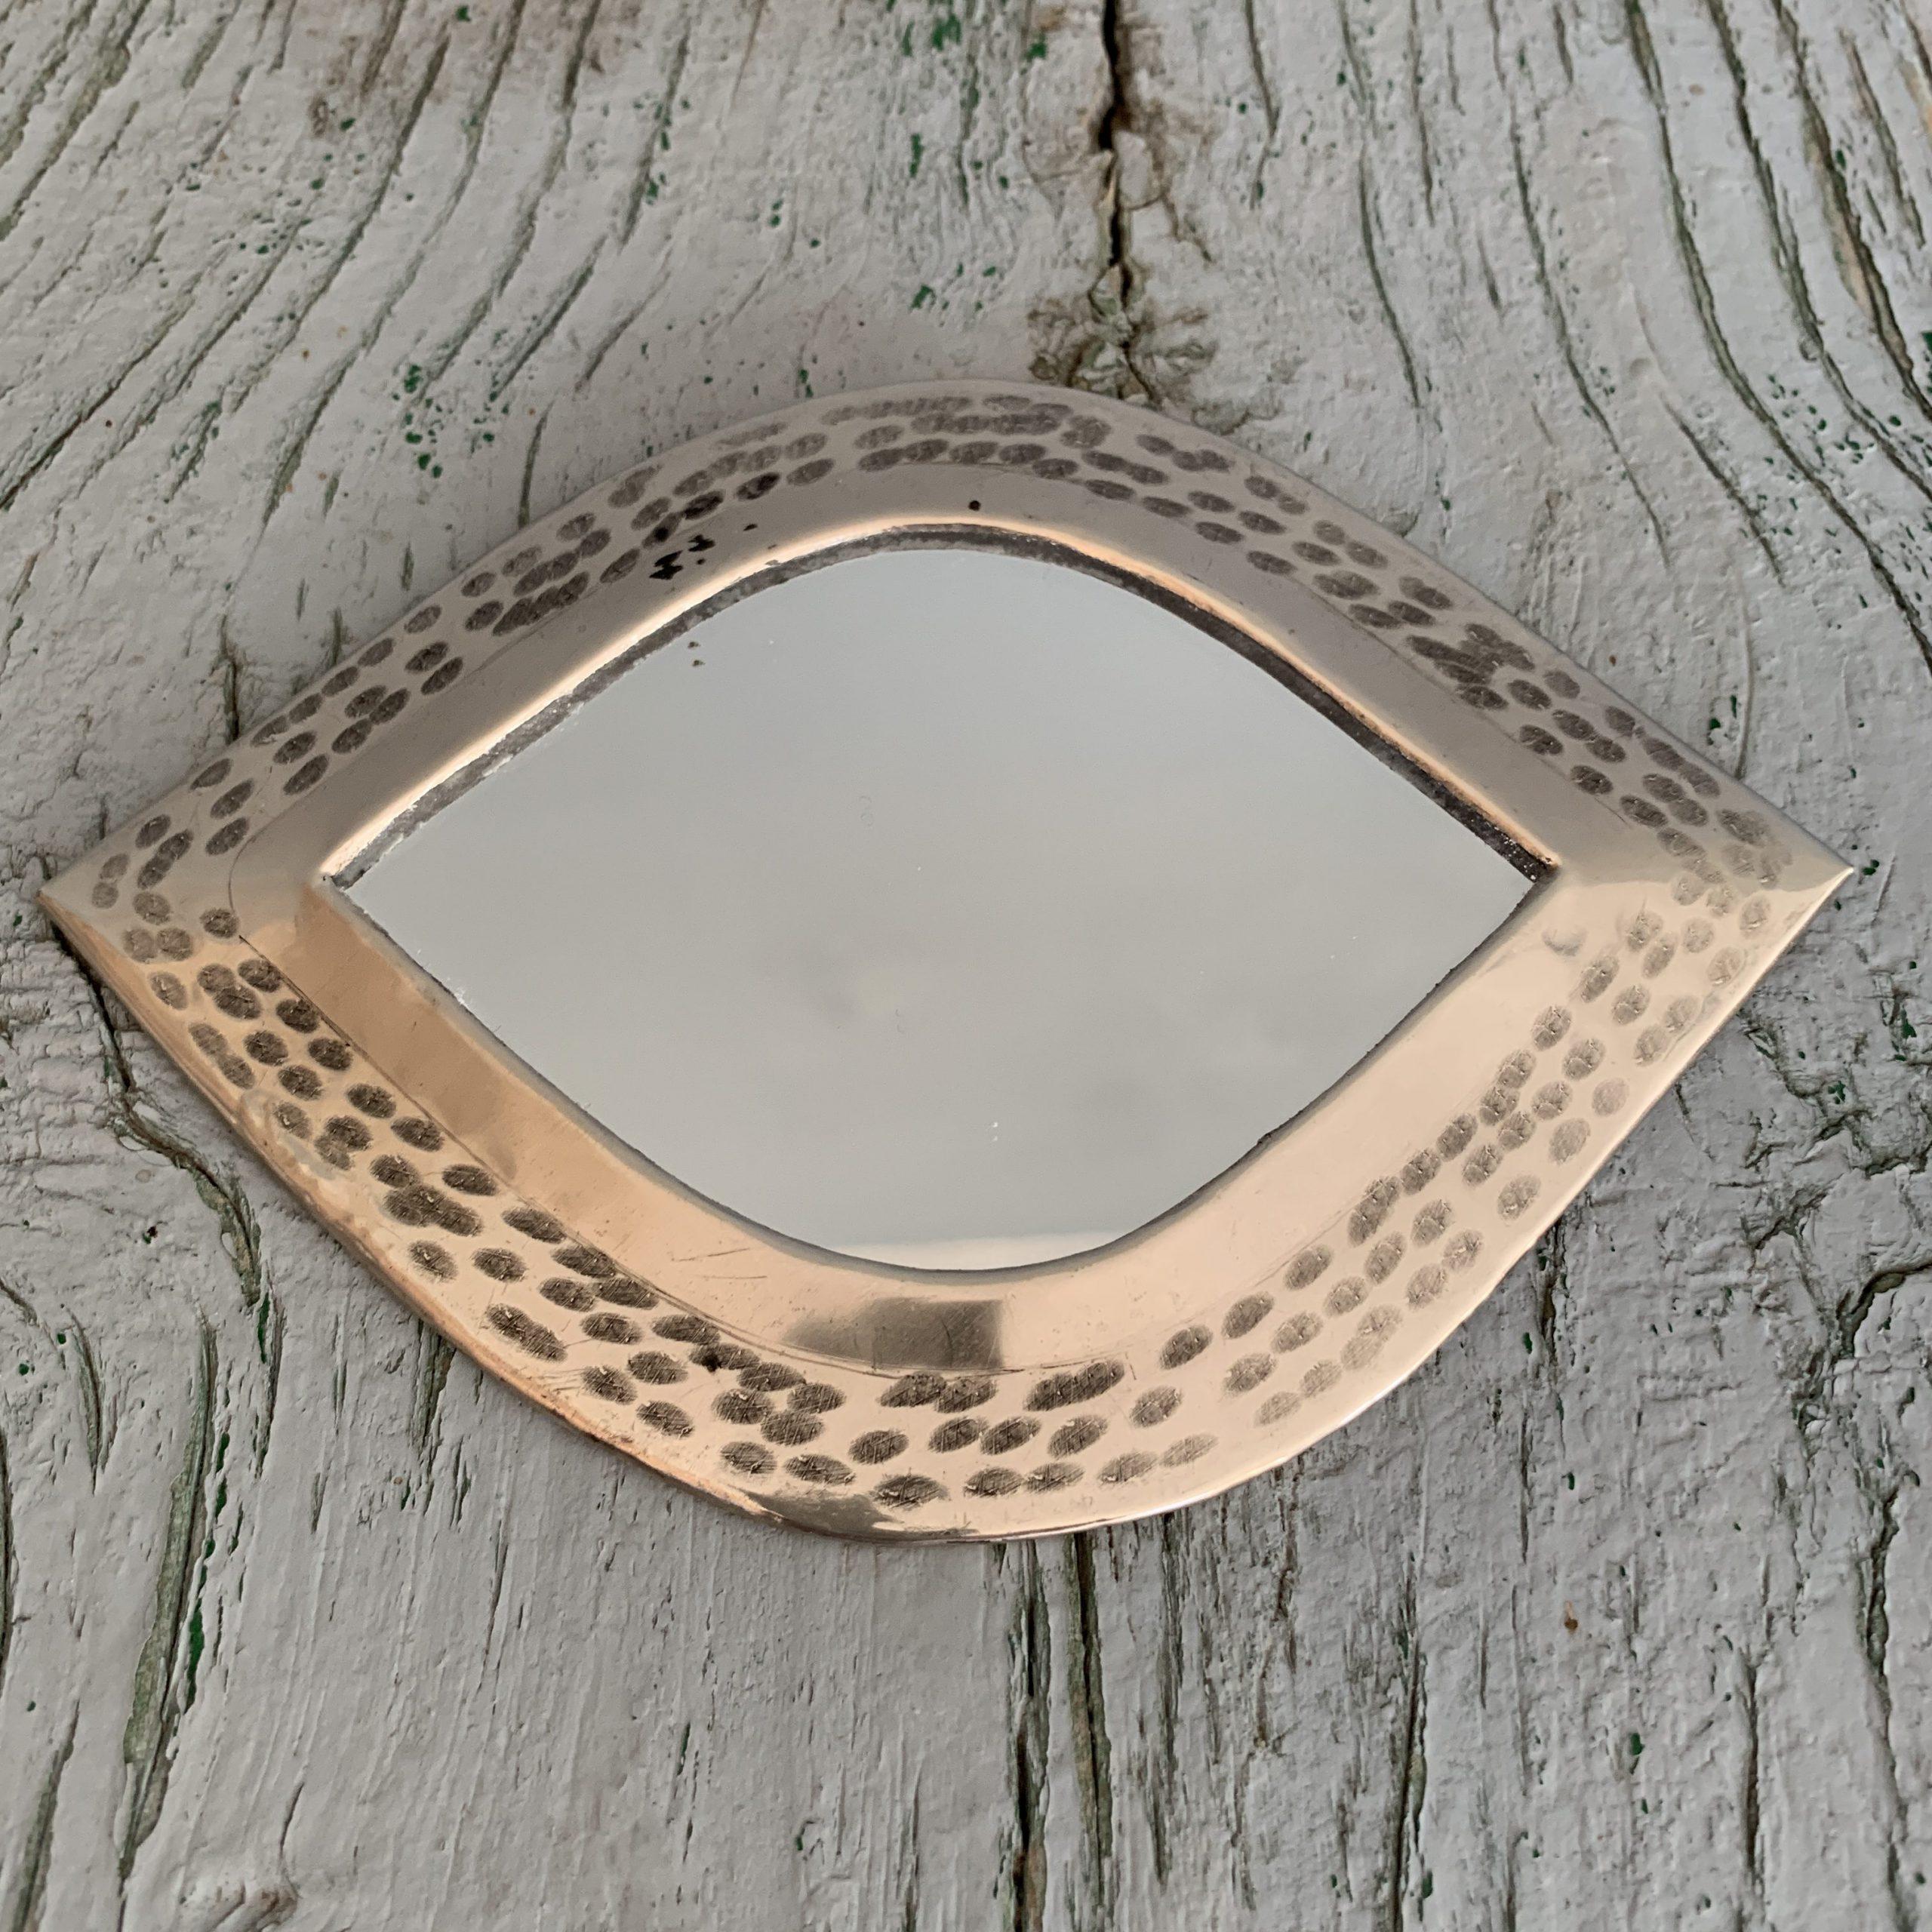 Marrokkaanse spiegeltjes zilver oog